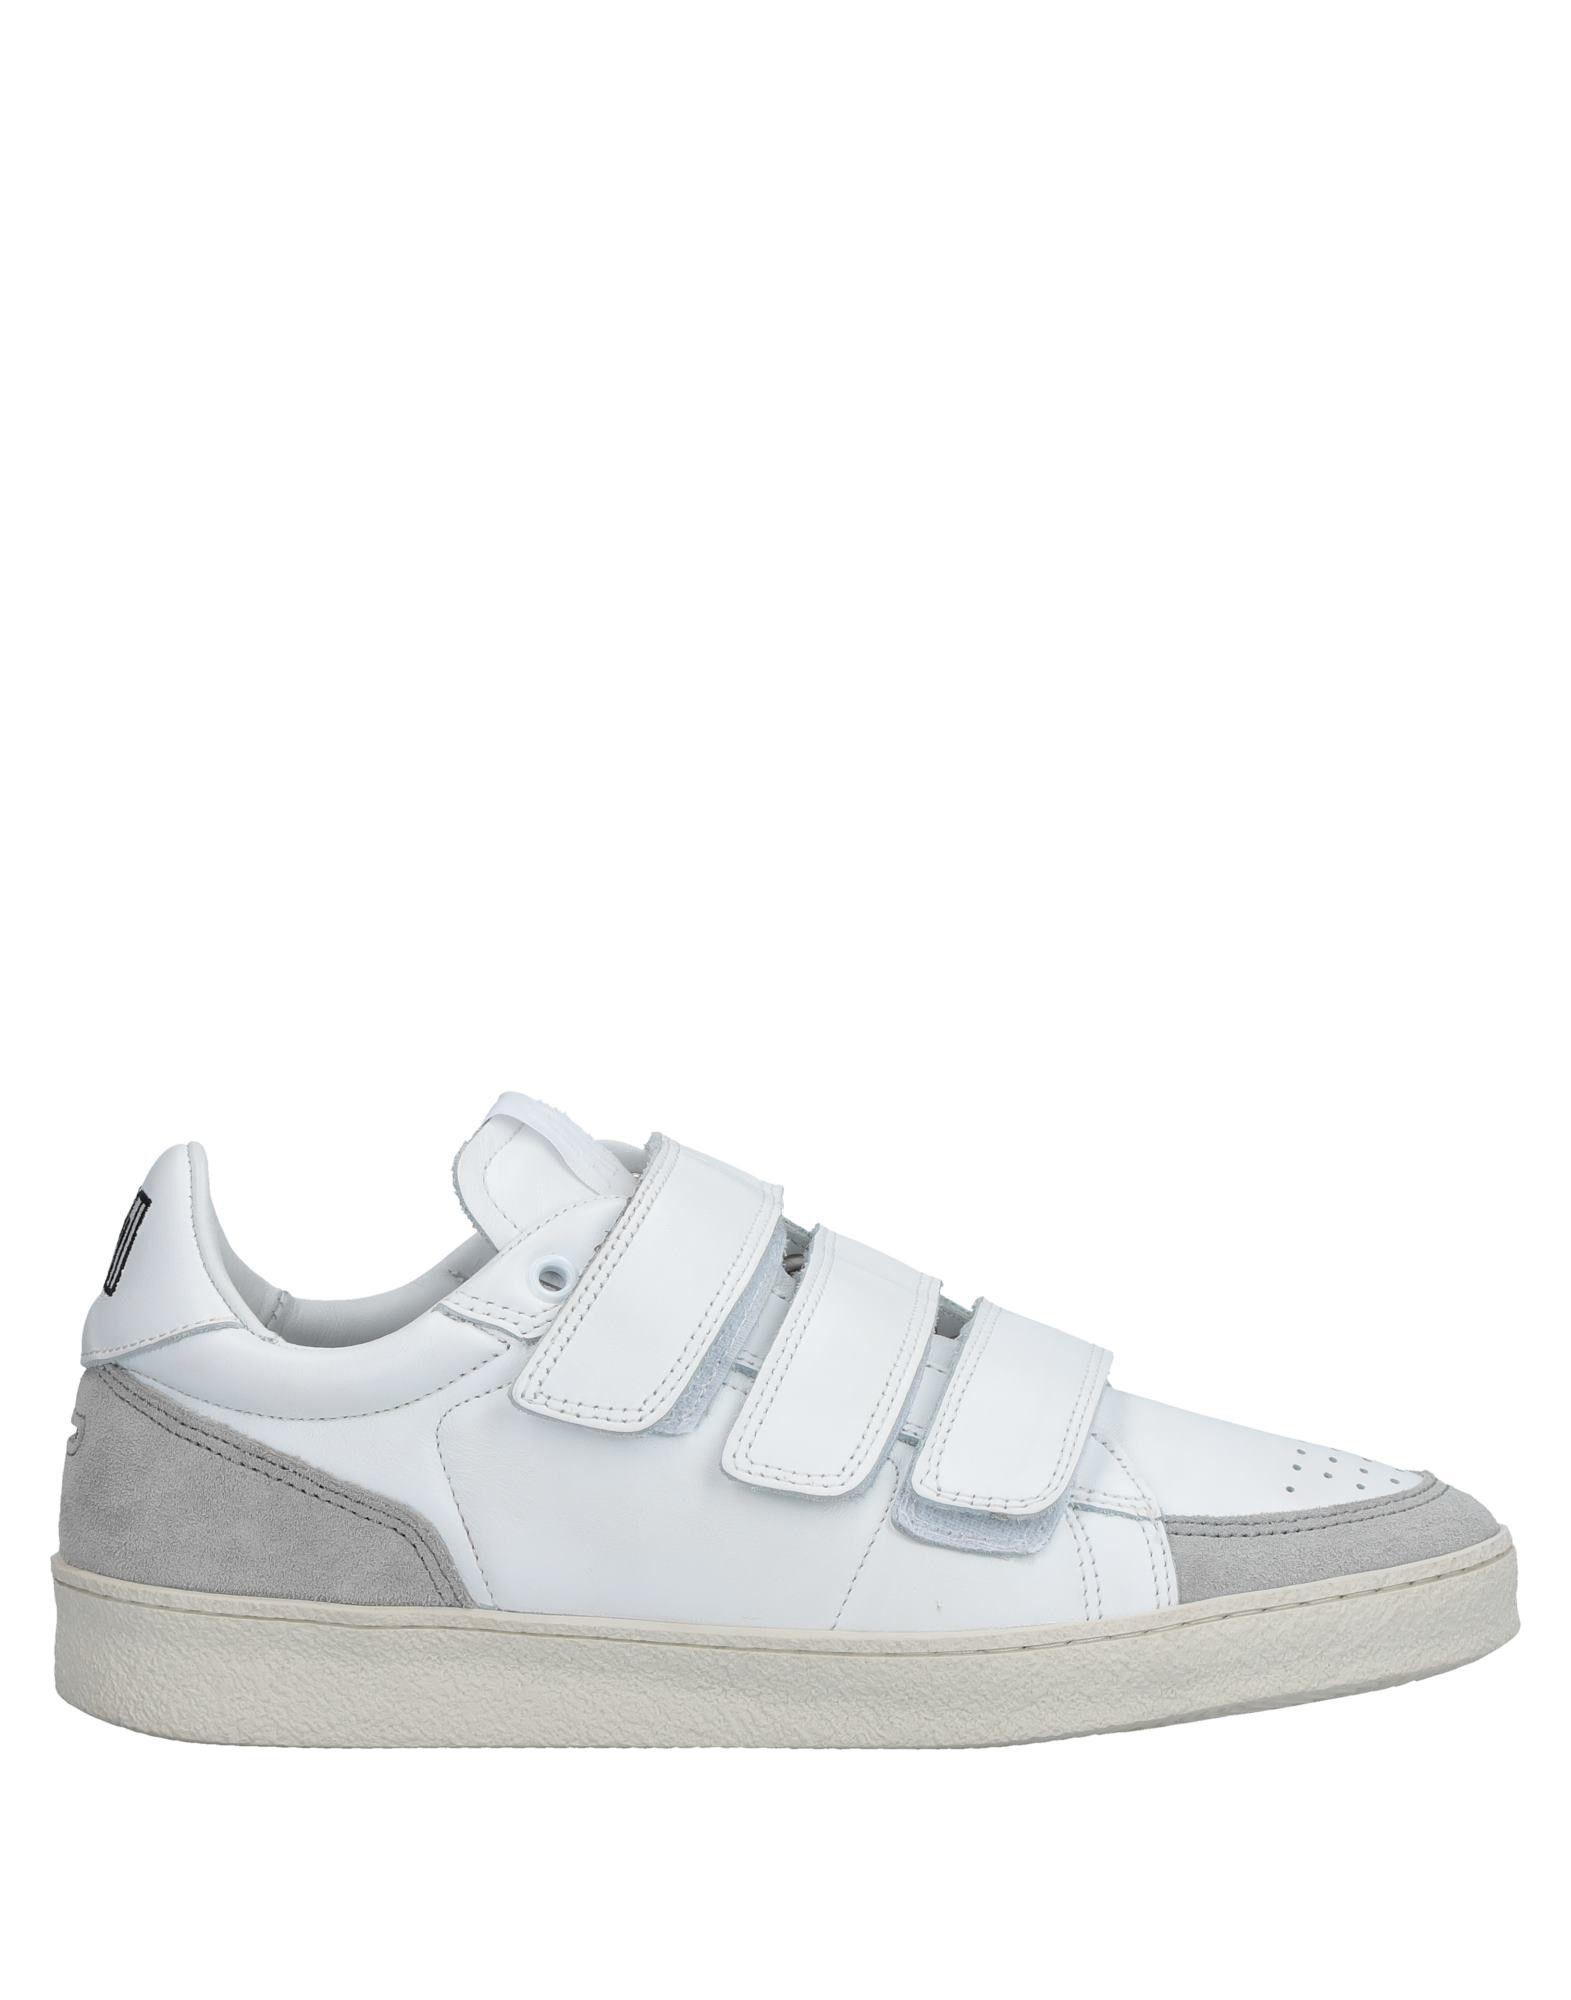 Ami Alexandre Mattiussi Sneakers Herren  11528159VA Gute Qualität beliebte Schuhe